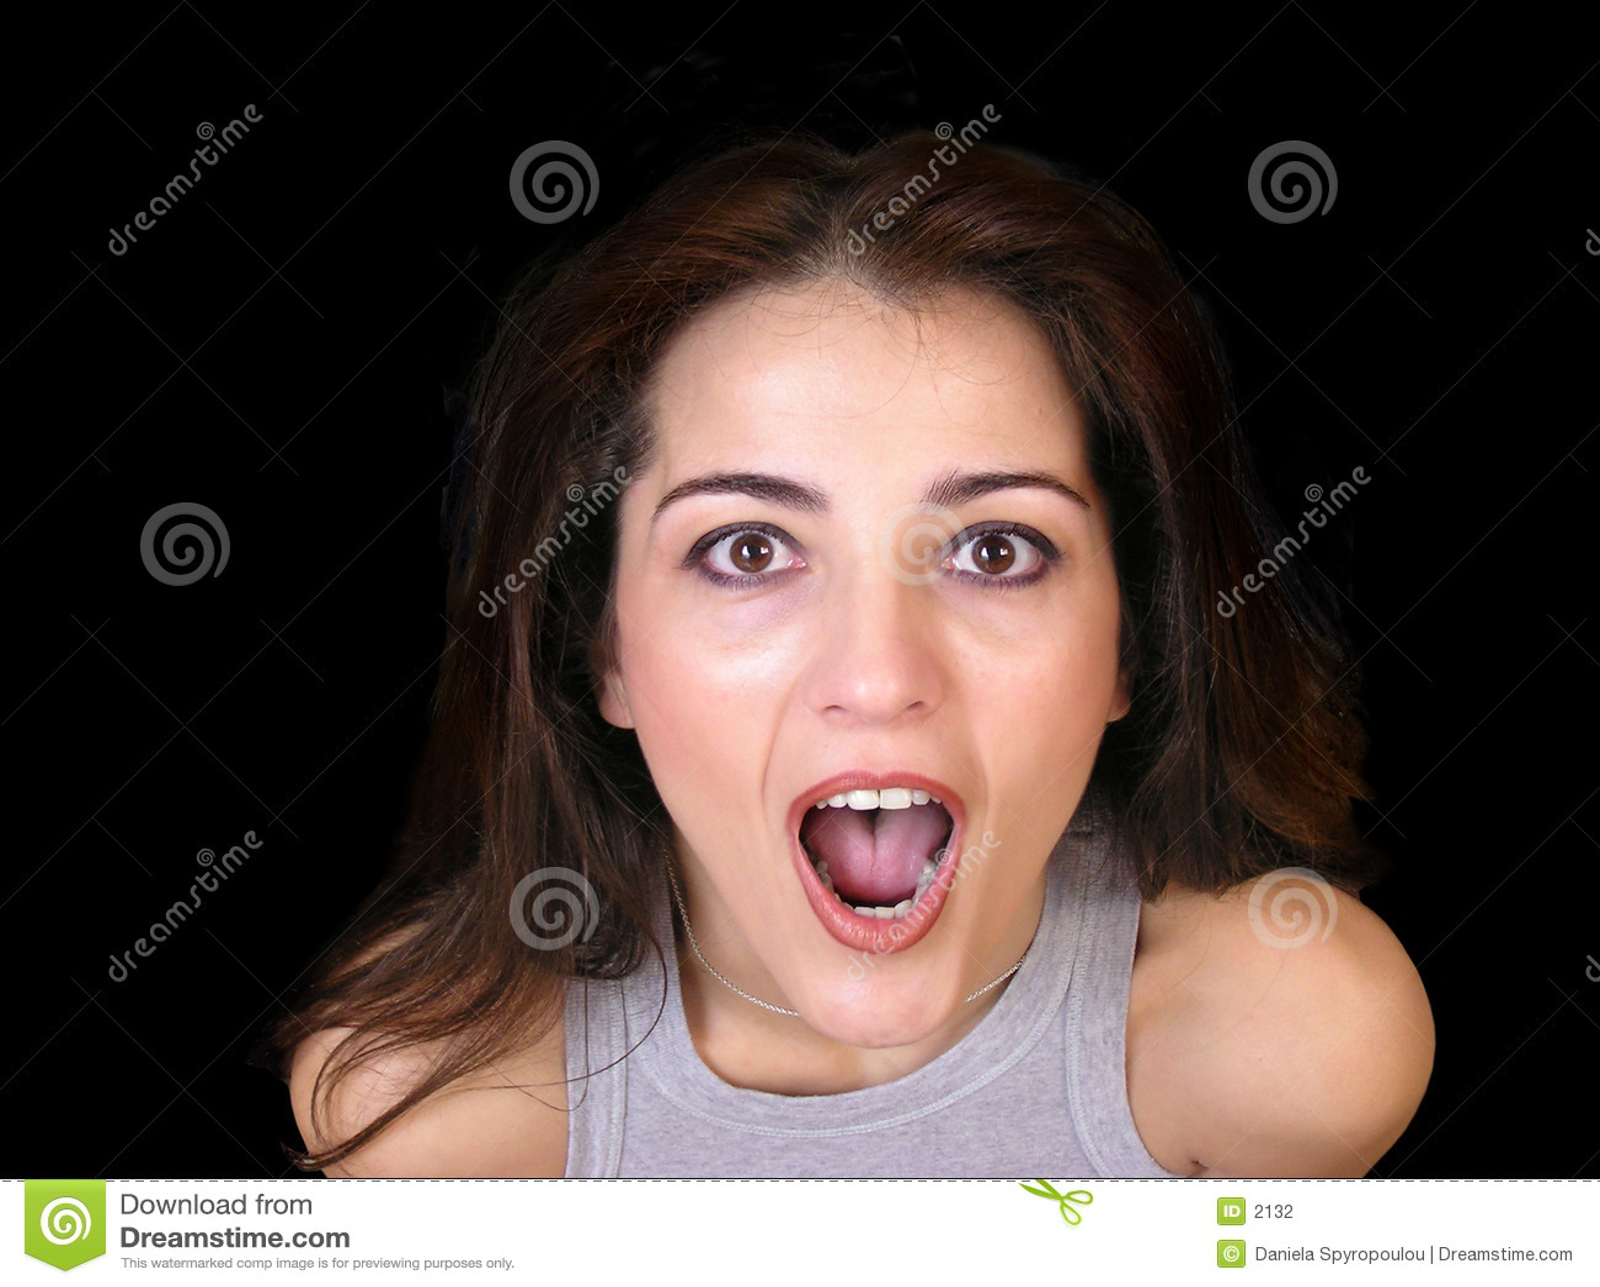 Download συγκινημένη γυναίκα στοκ εικόνες. εικόνα από ζαλισμένος, γοητευμένος - 2132